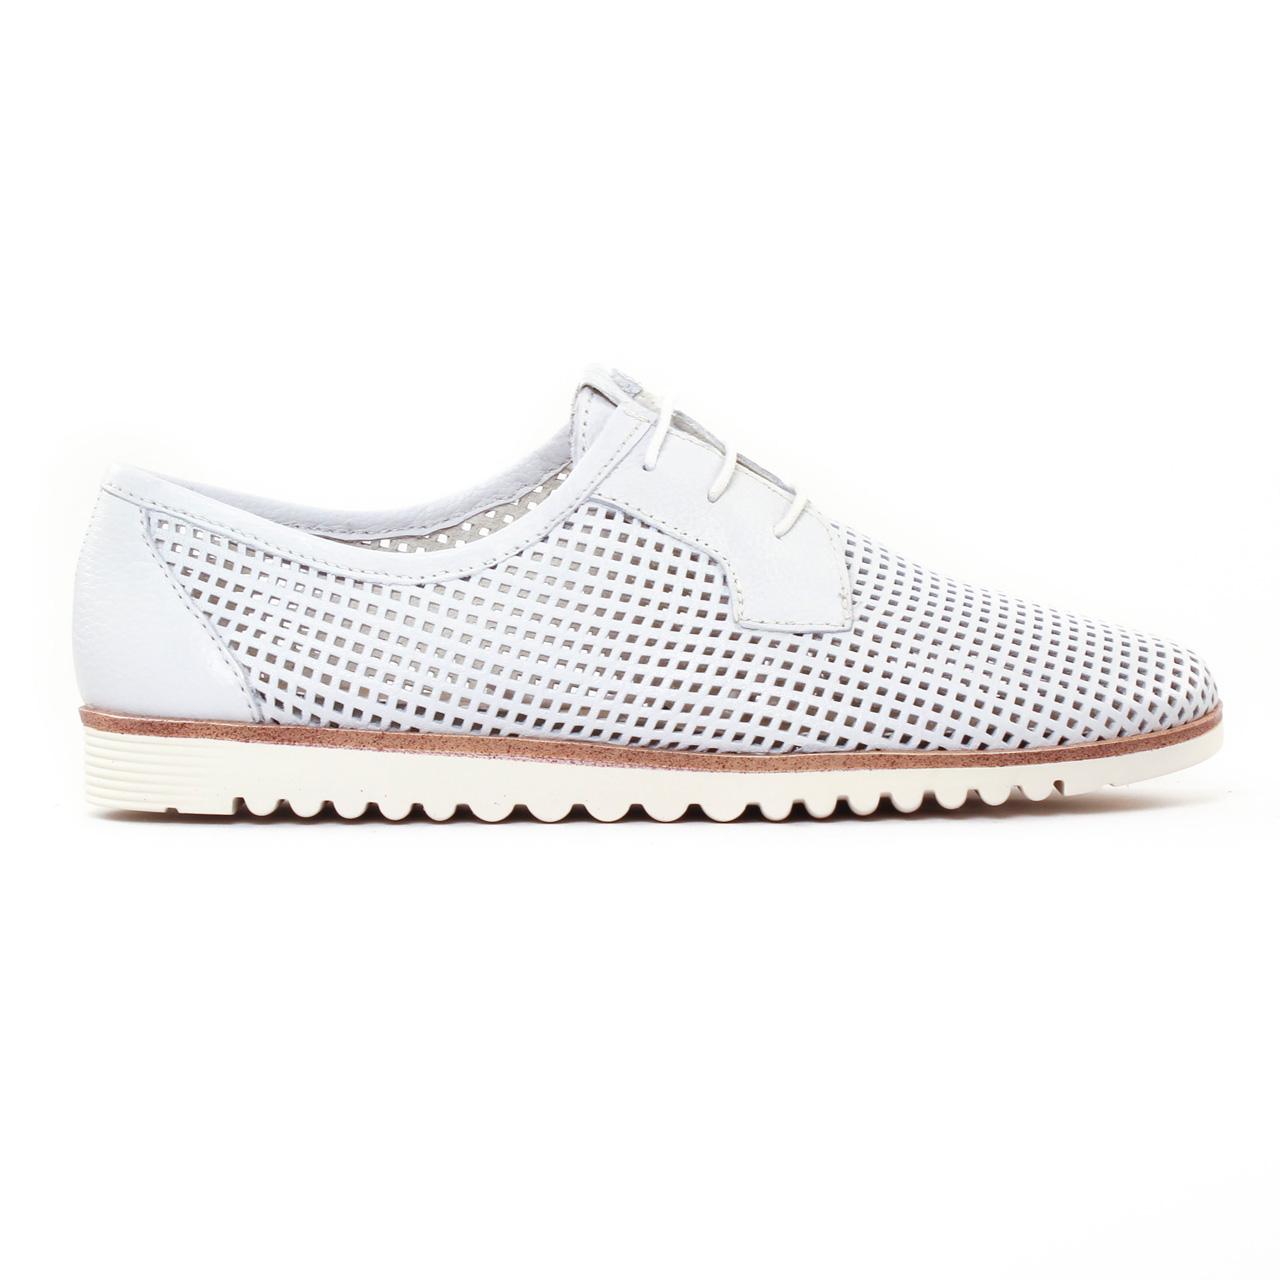 23603, Sneakers Basses Femme, Blanc (White), 40 EUTamaris